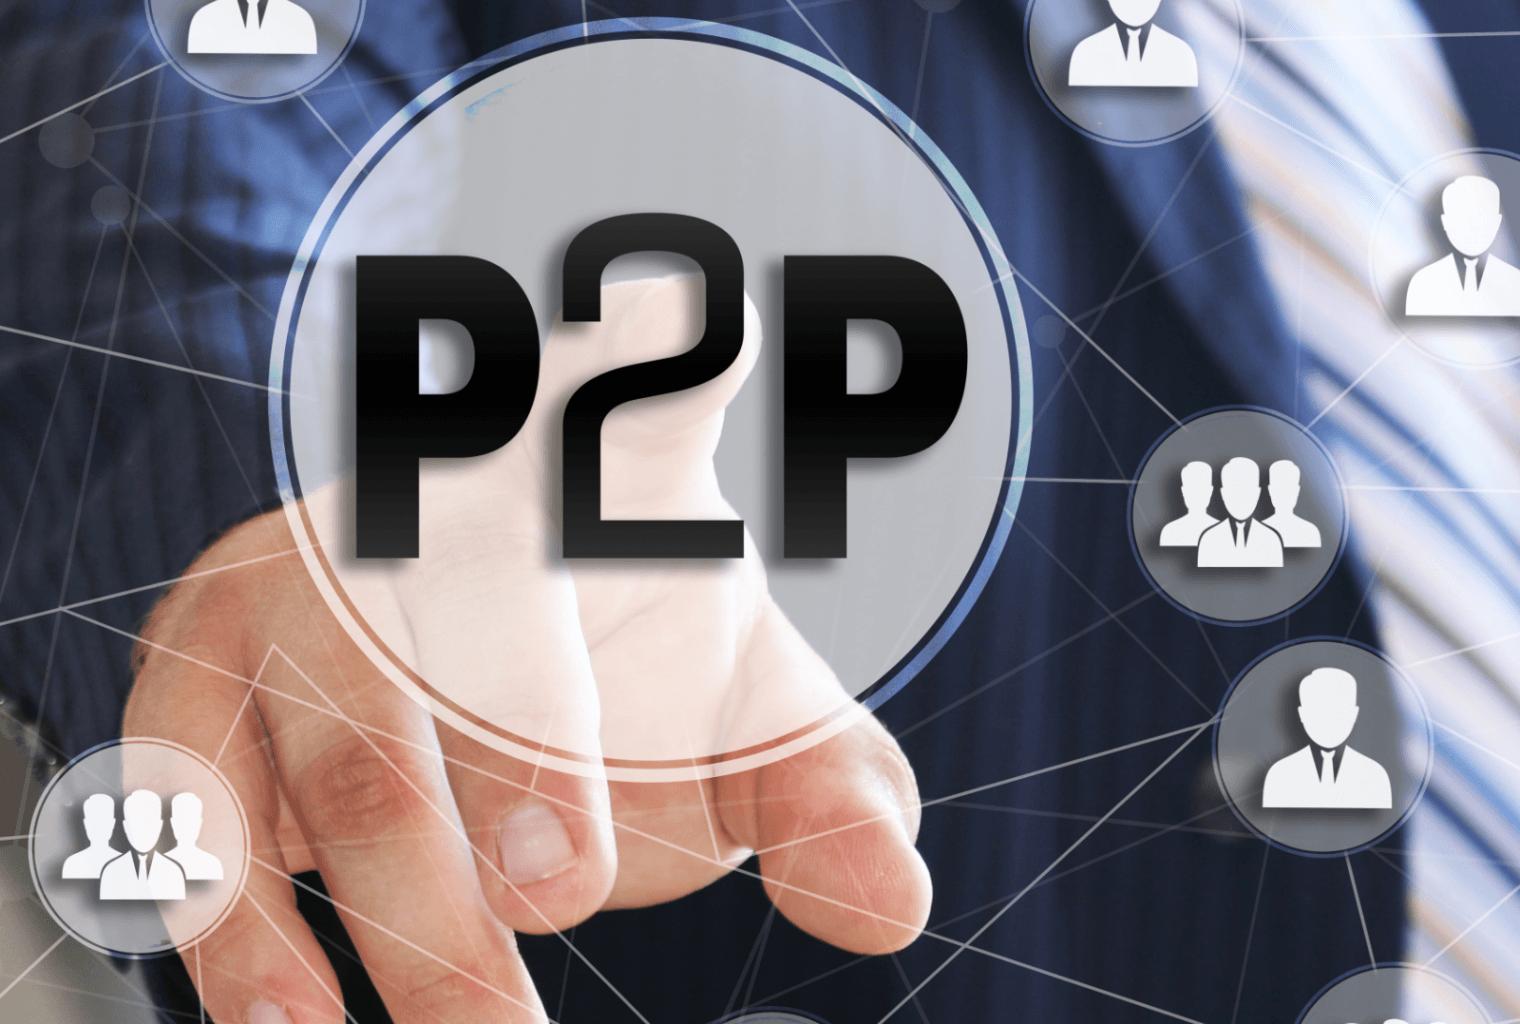 P2P_Trading-73510-0fda1e.png